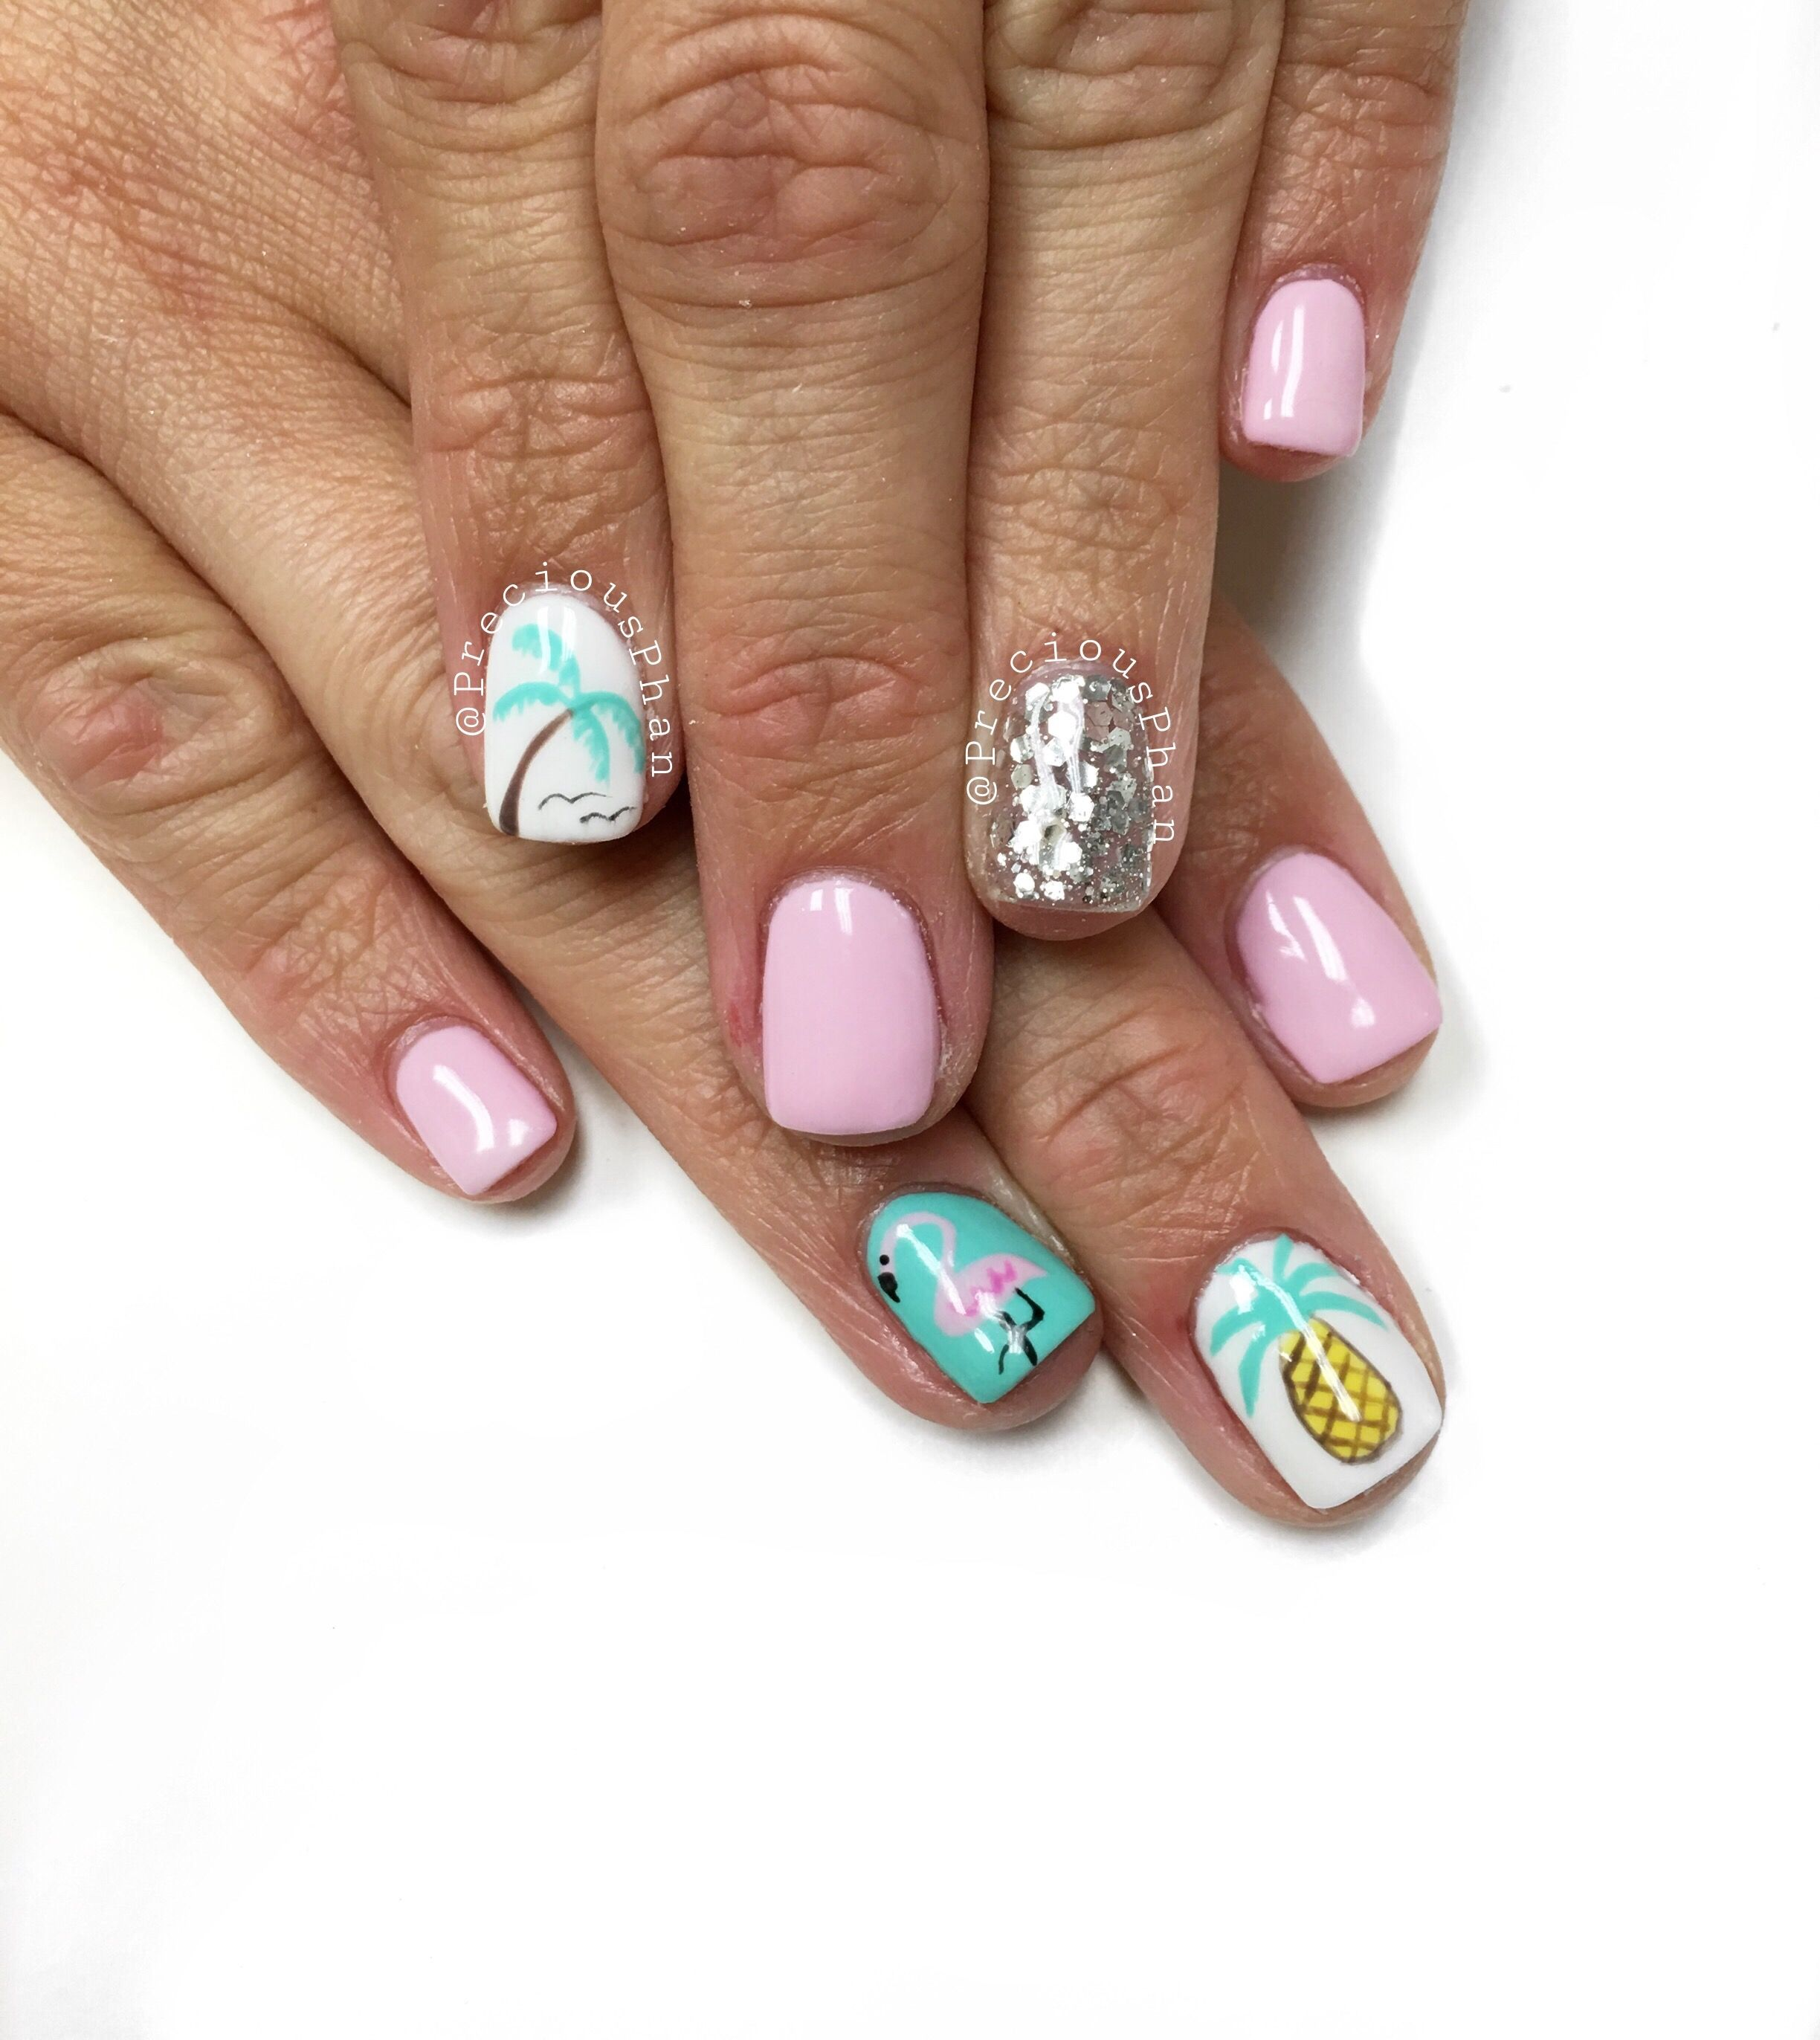 Summer nails. Beach nails. Vacation nails. Palm trees. Pineapple ...